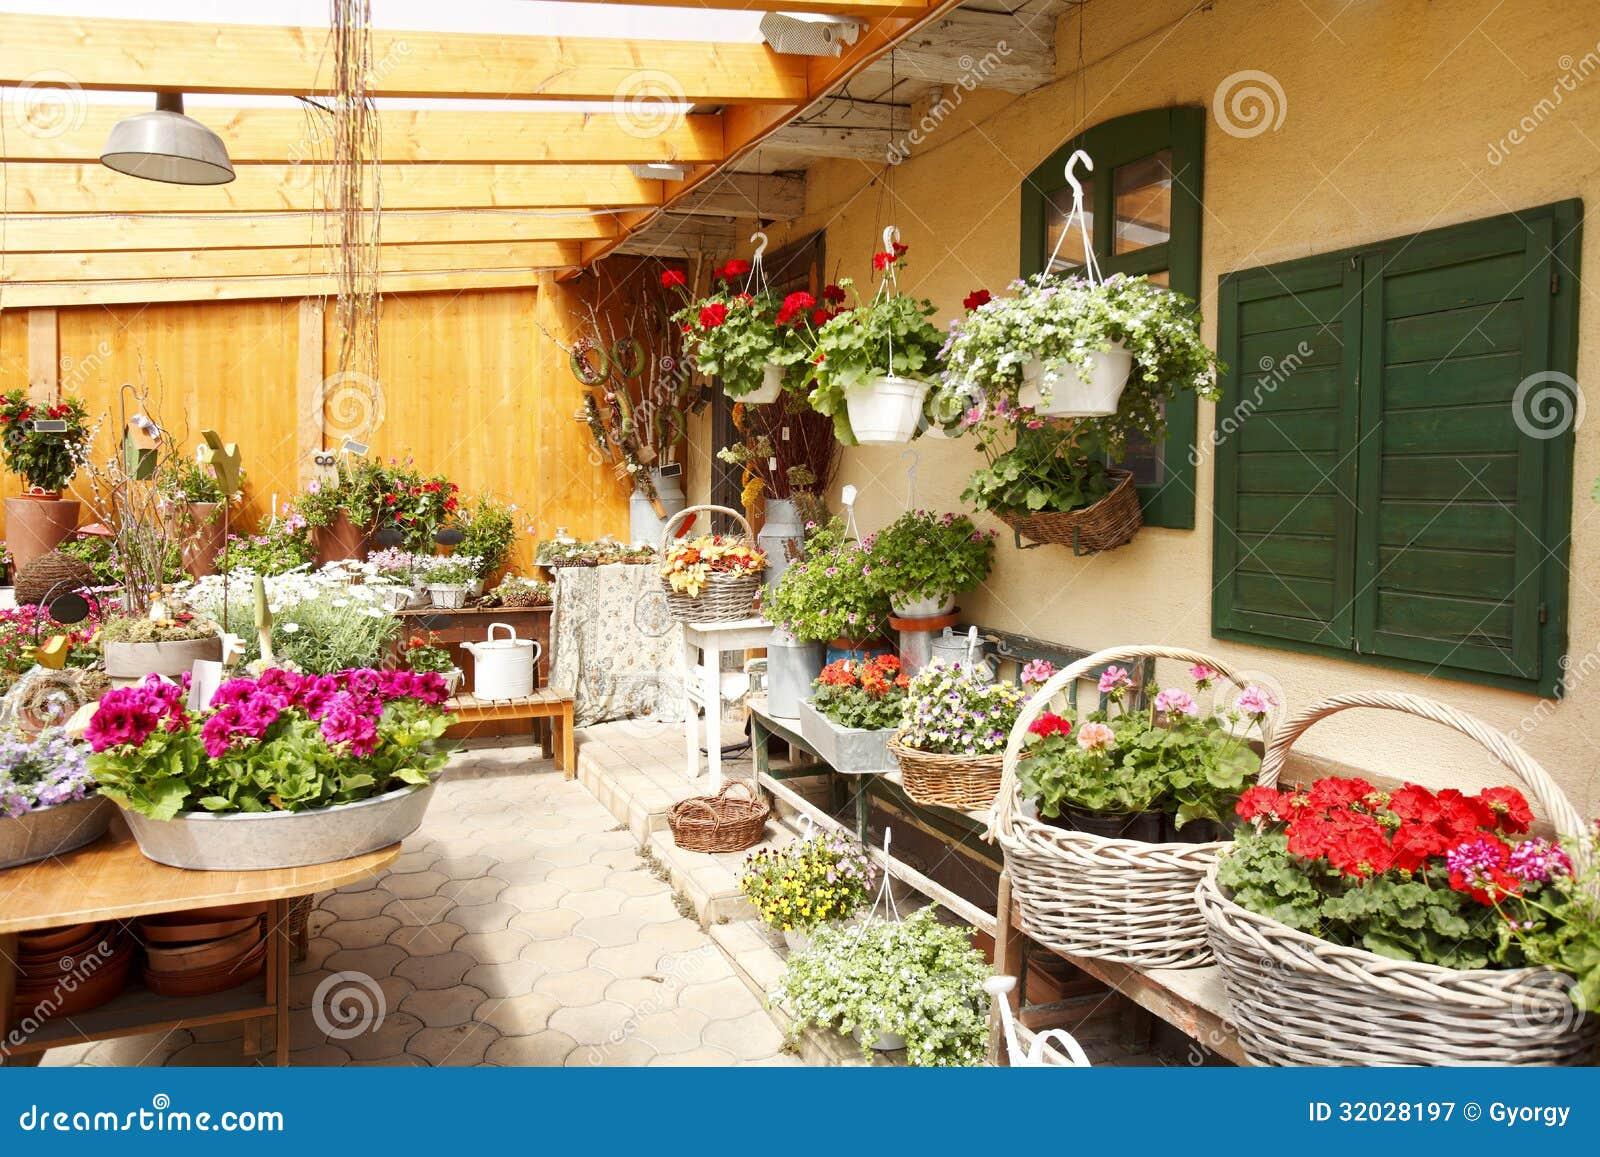 http://thumbs.dreamstime.com/z/flower-shop-interior-flowers-merchant-small-business-32028197.jpg